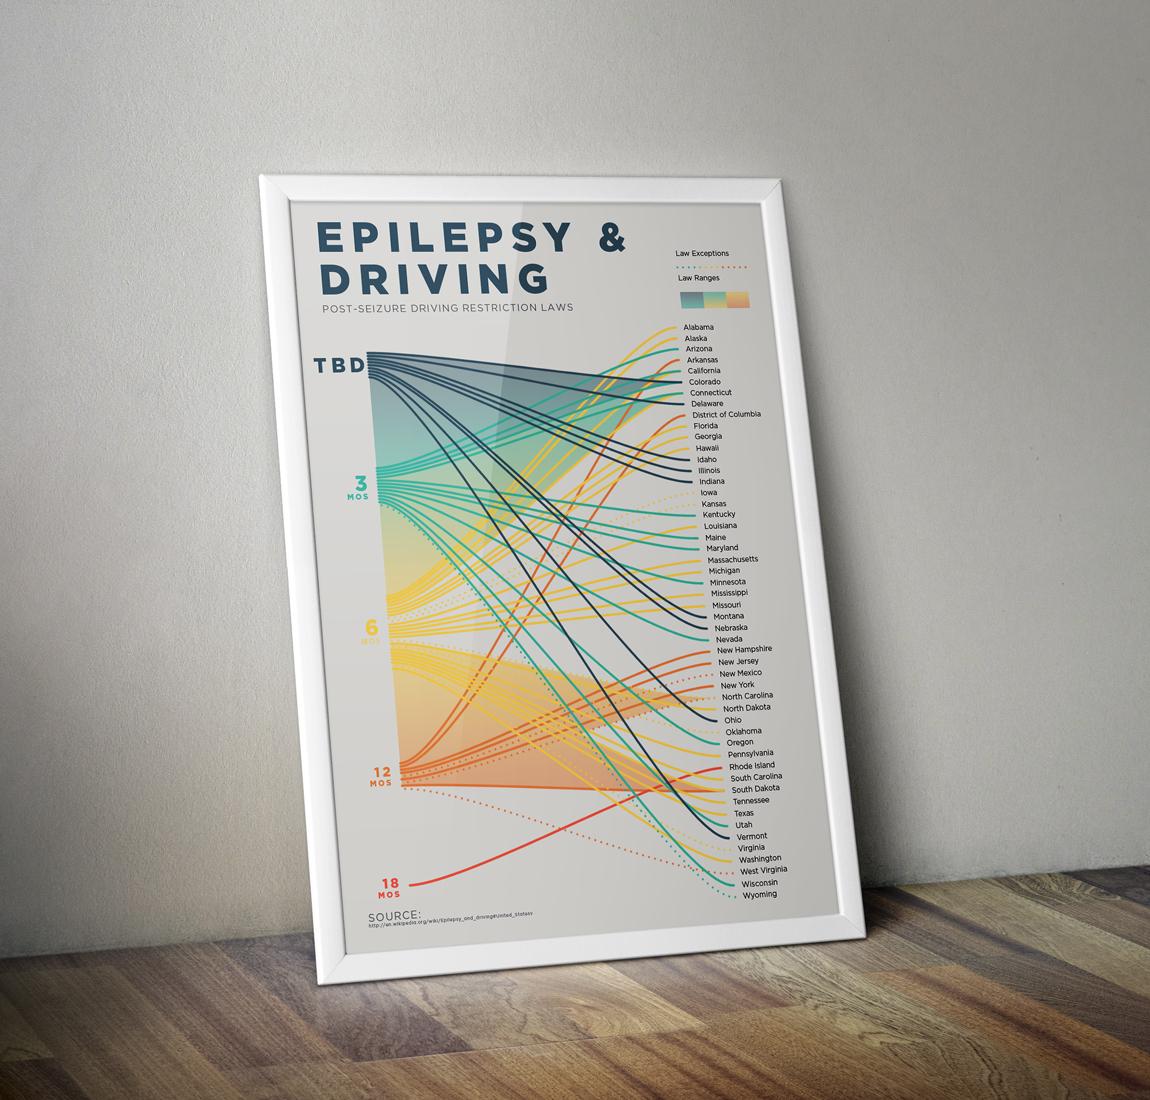 Epilepsy & Driving